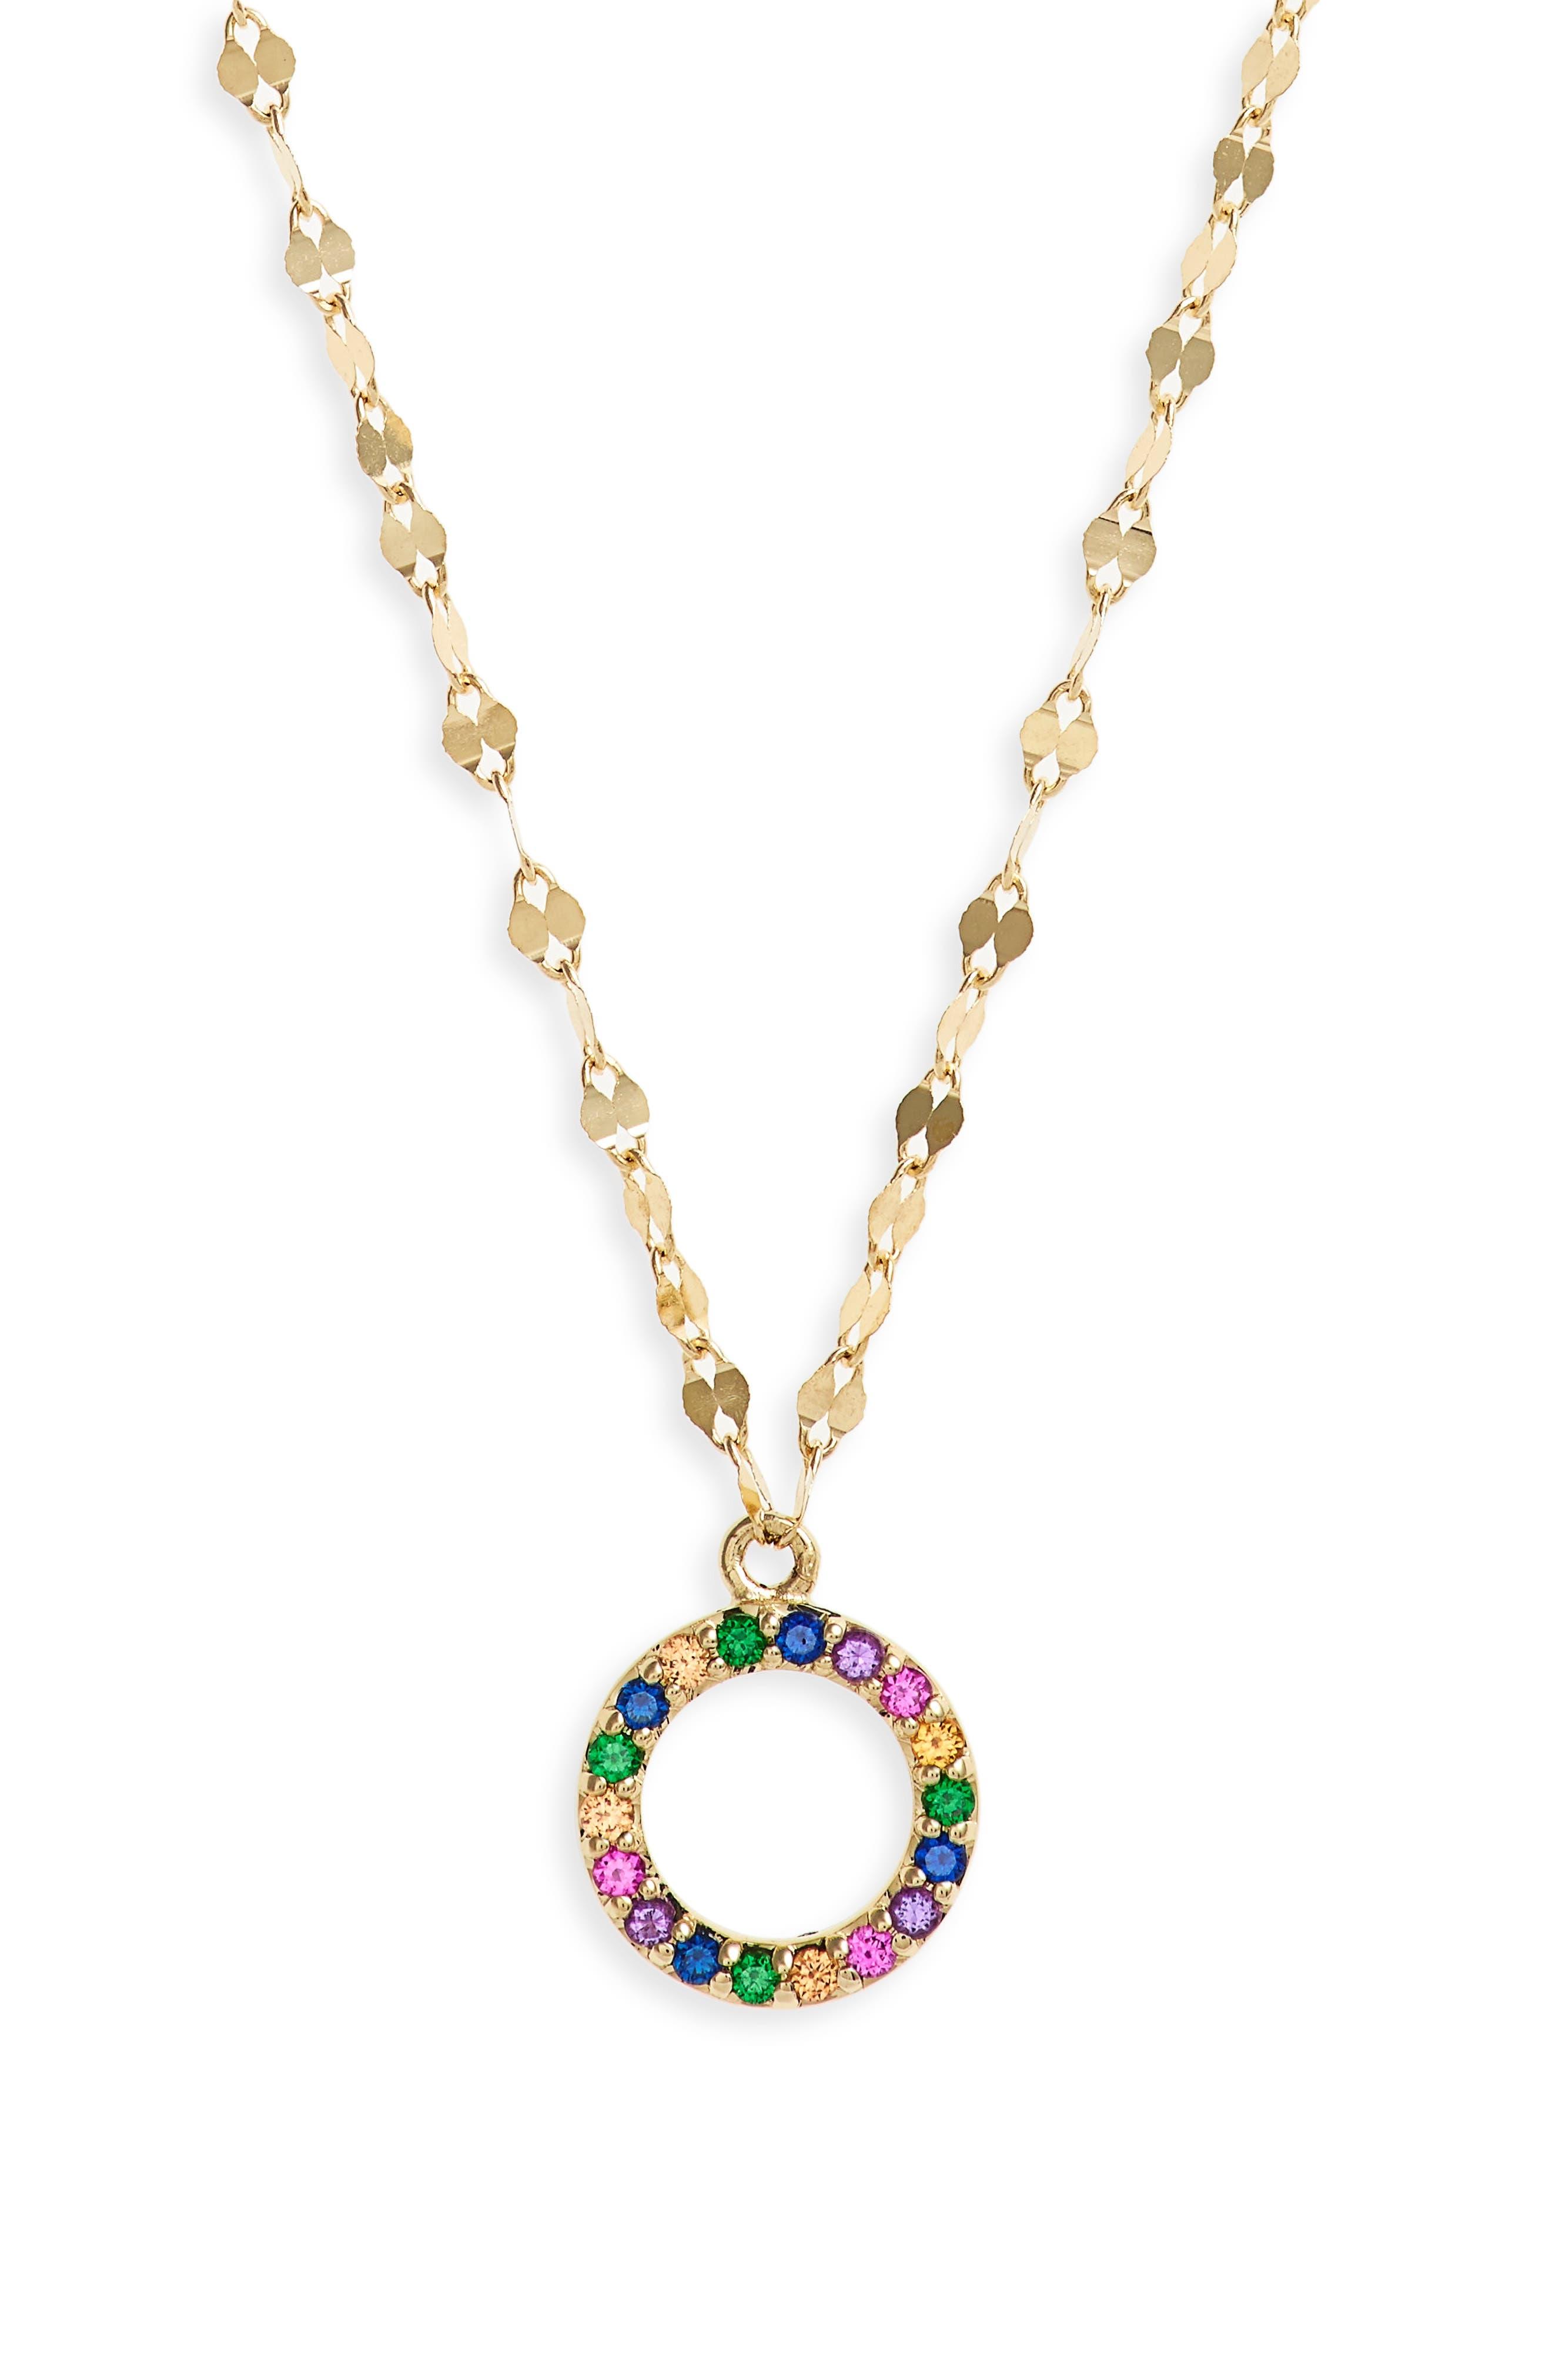 Alternate Image 1 Selected - Lana Girl by Lana Jewelry Mini Circle Sapphire Pendant Necklace (Girls)